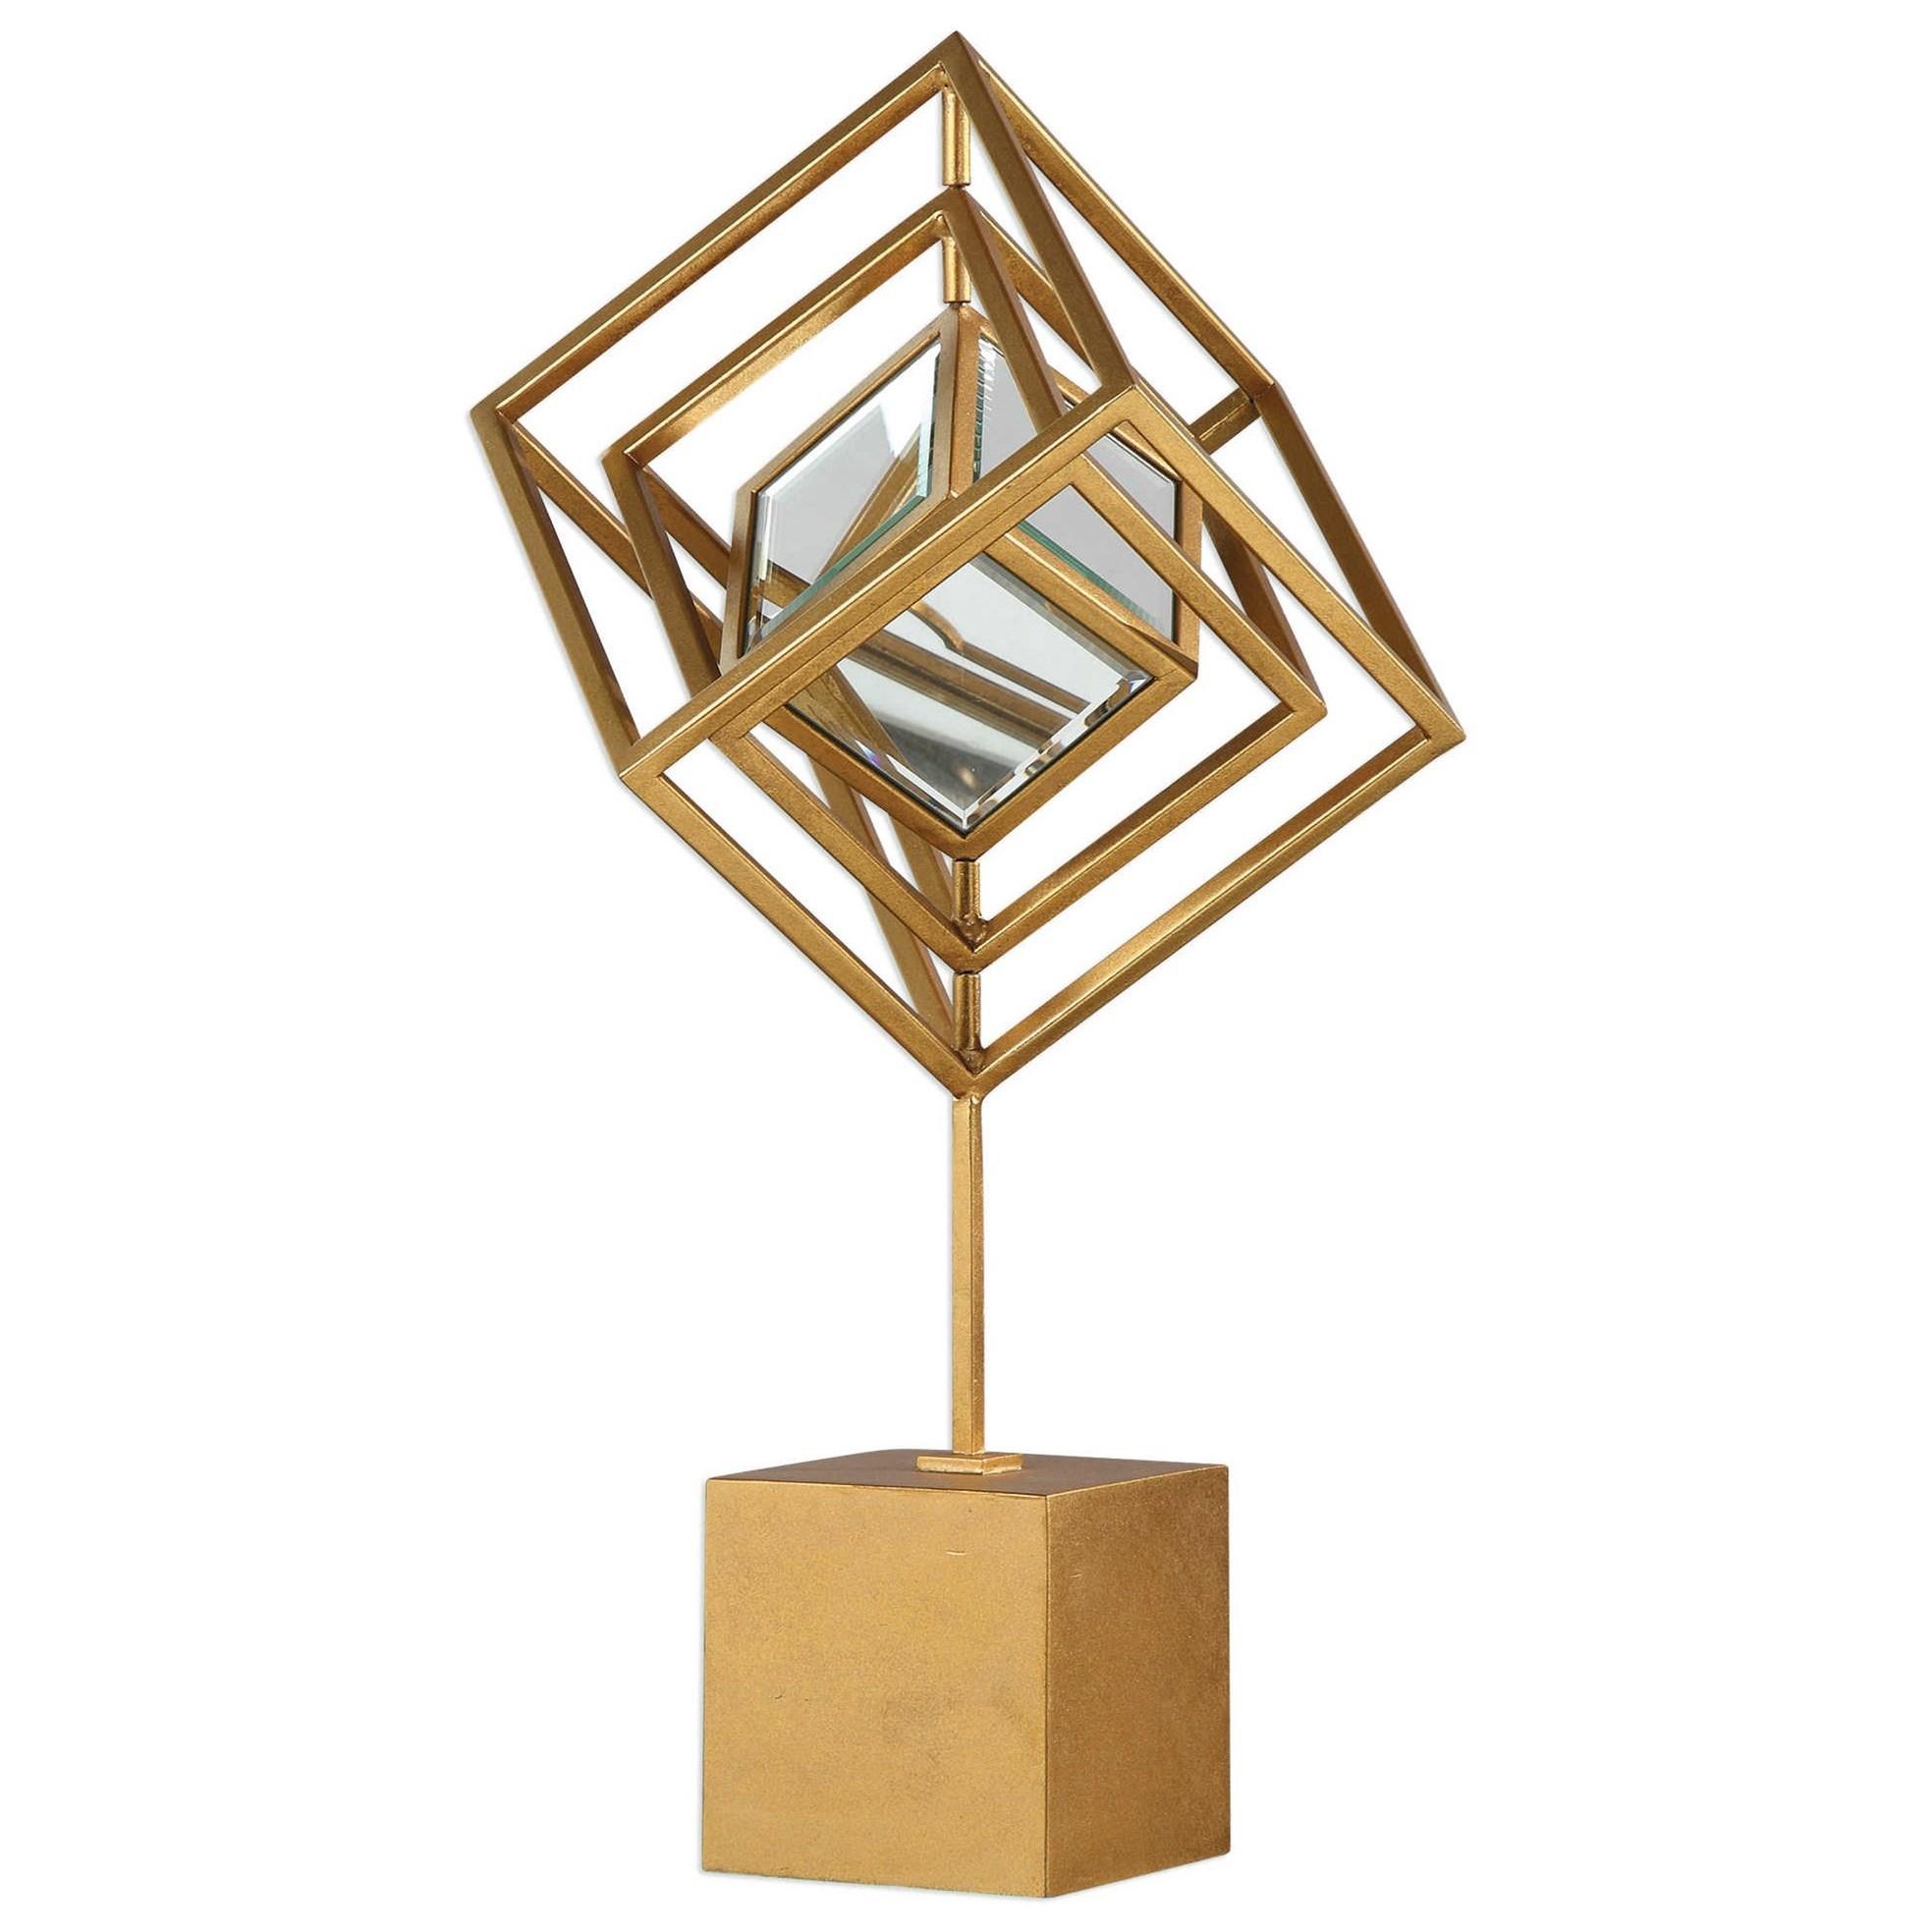 Venya Metallic Gold Sculpture